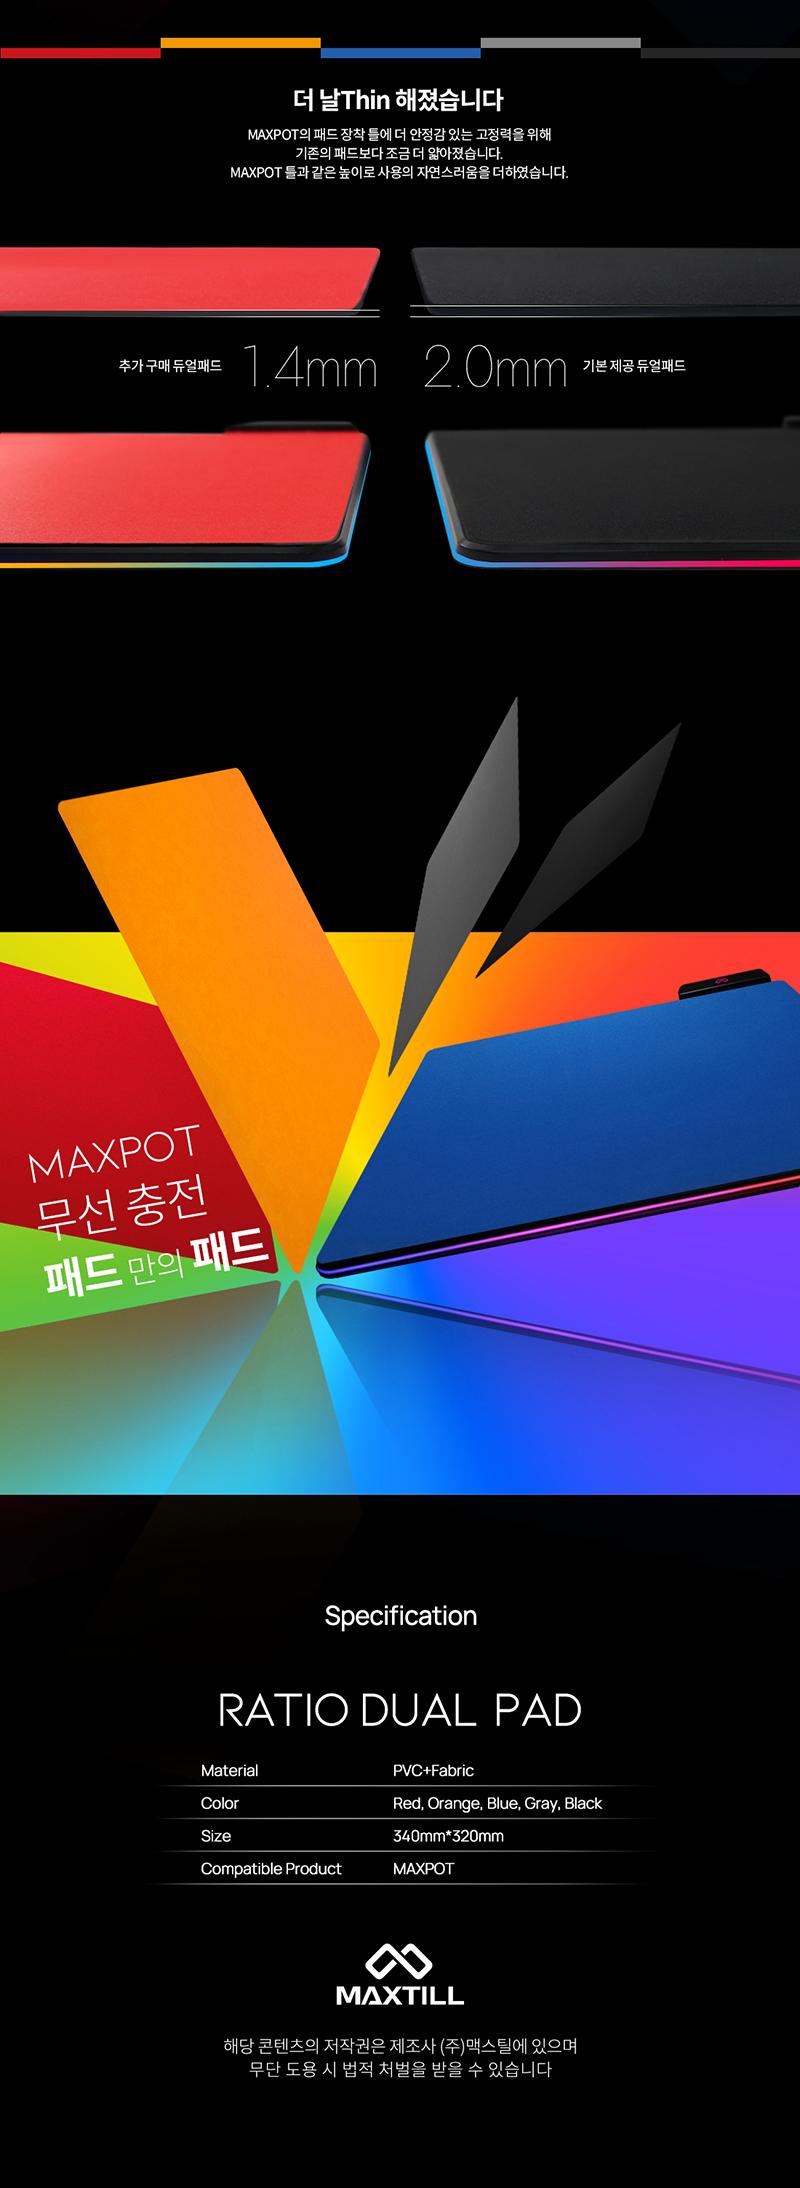 MAXTILL RATIO MAXPOT 교체 듀얼 패드 (그레이)